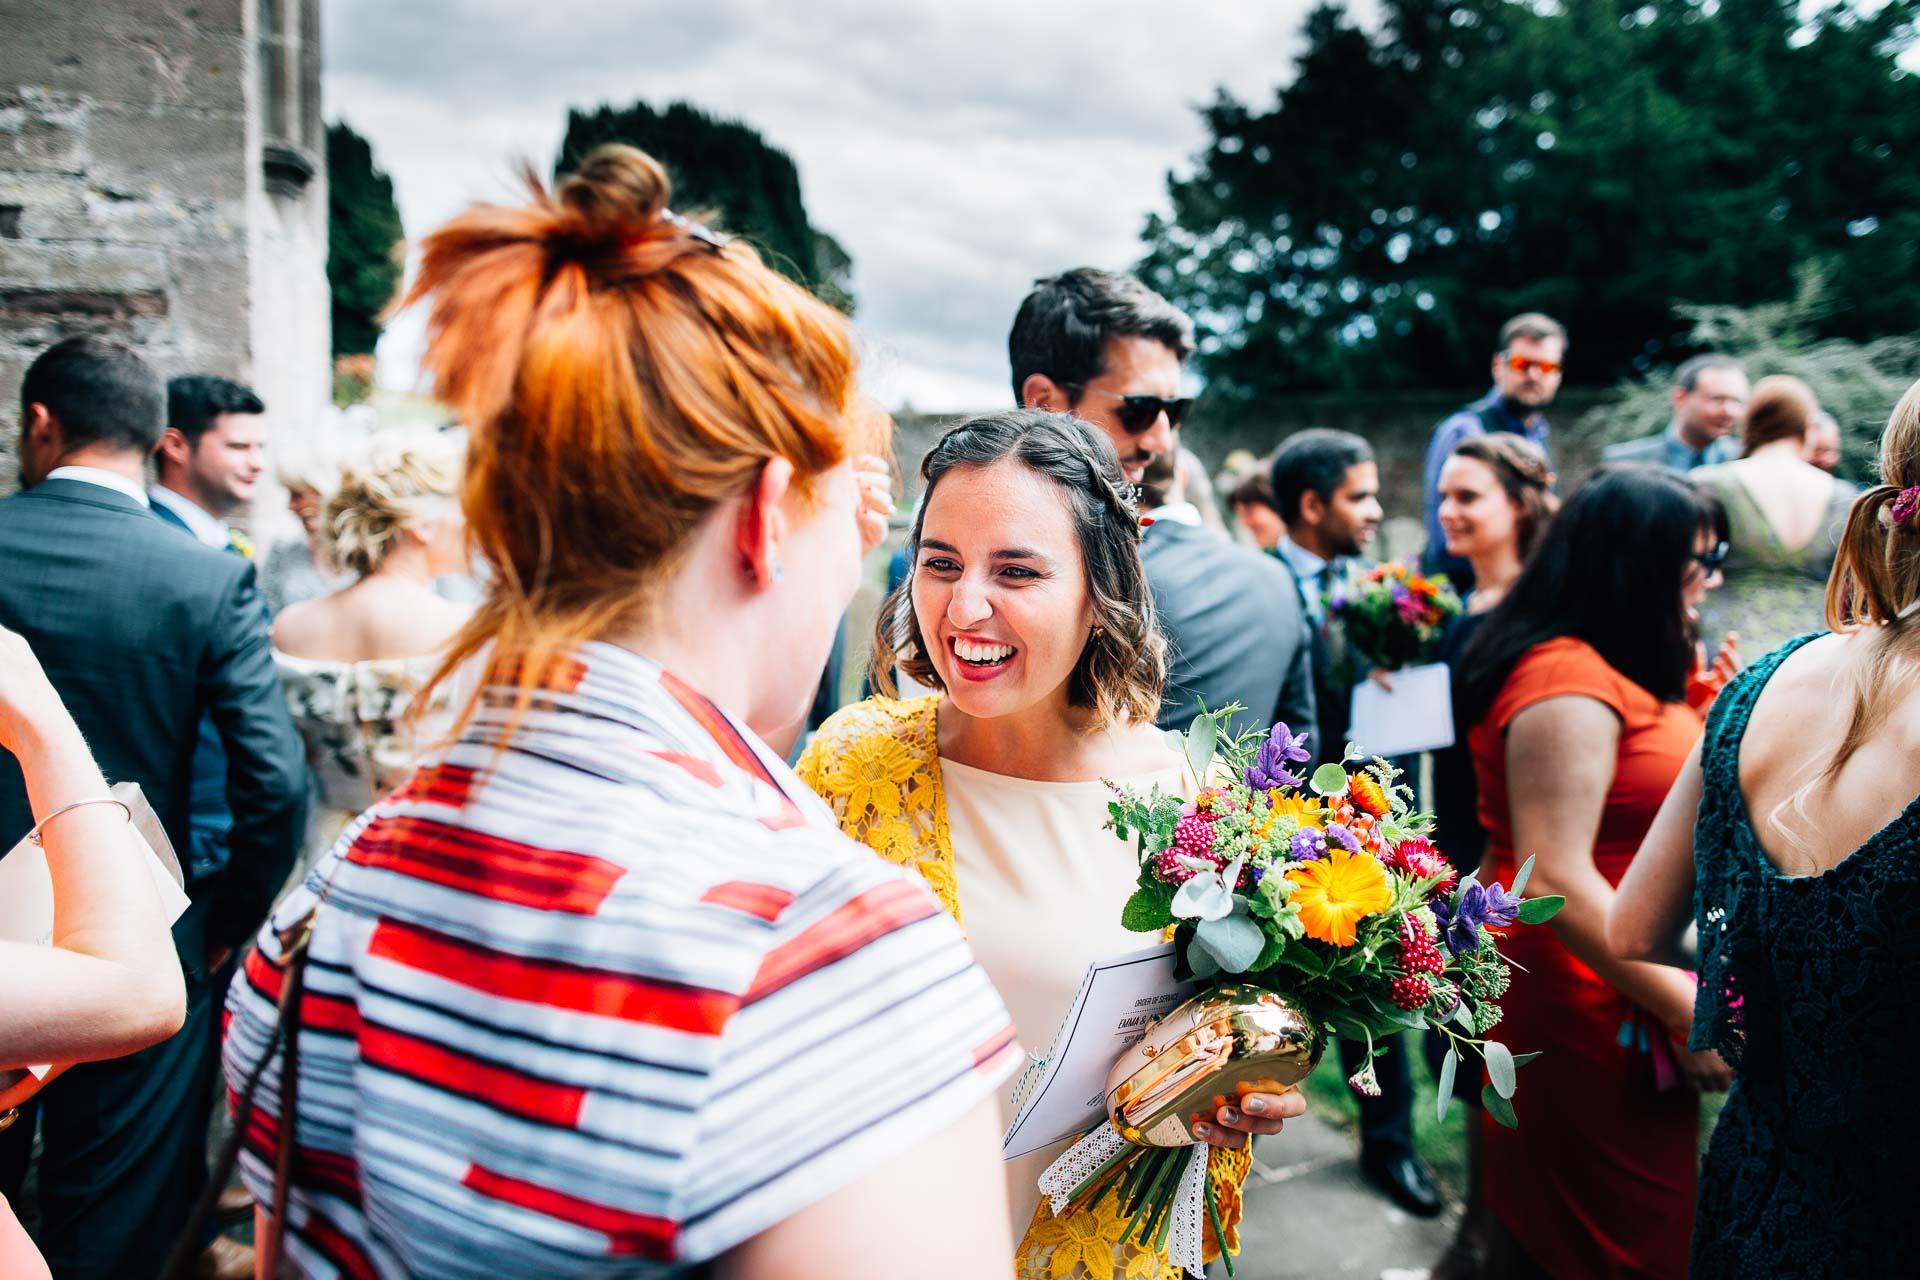 winterbourne-medieval-barn-wedding-photography-emma-andrew-64